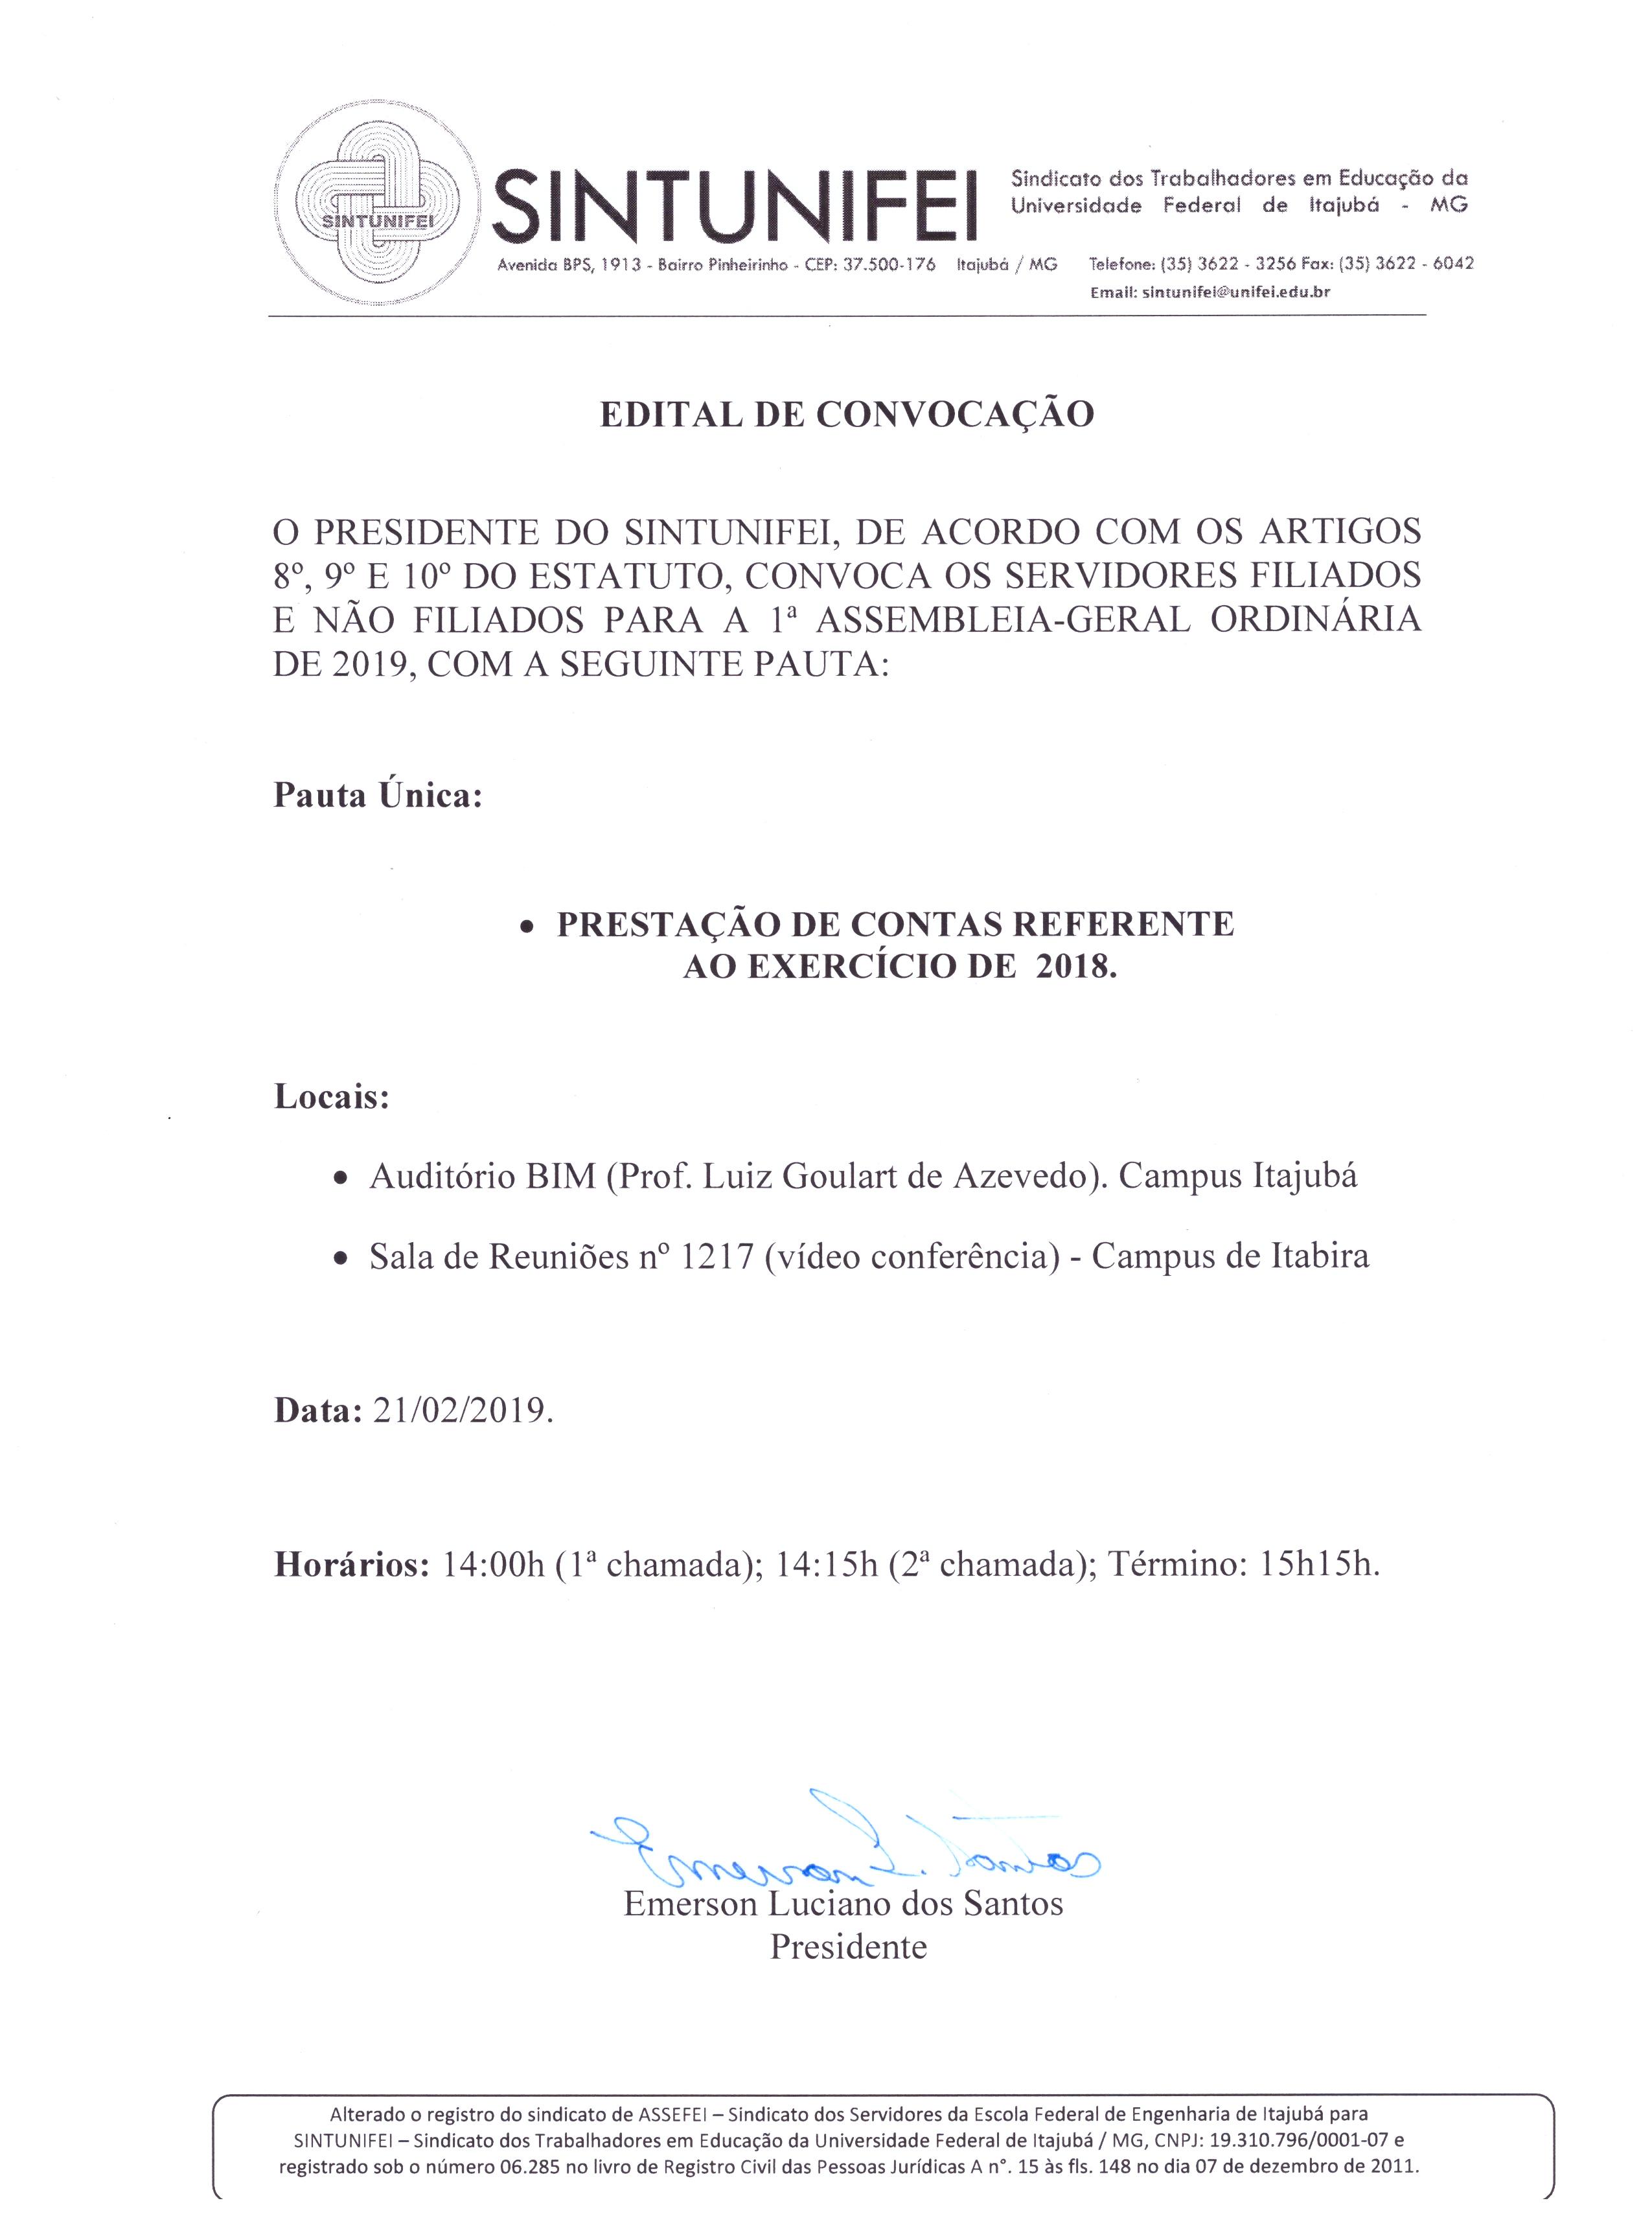 Edital da 1ª Assembleia Geral Ordinária de 2019- SINTUNIFEI